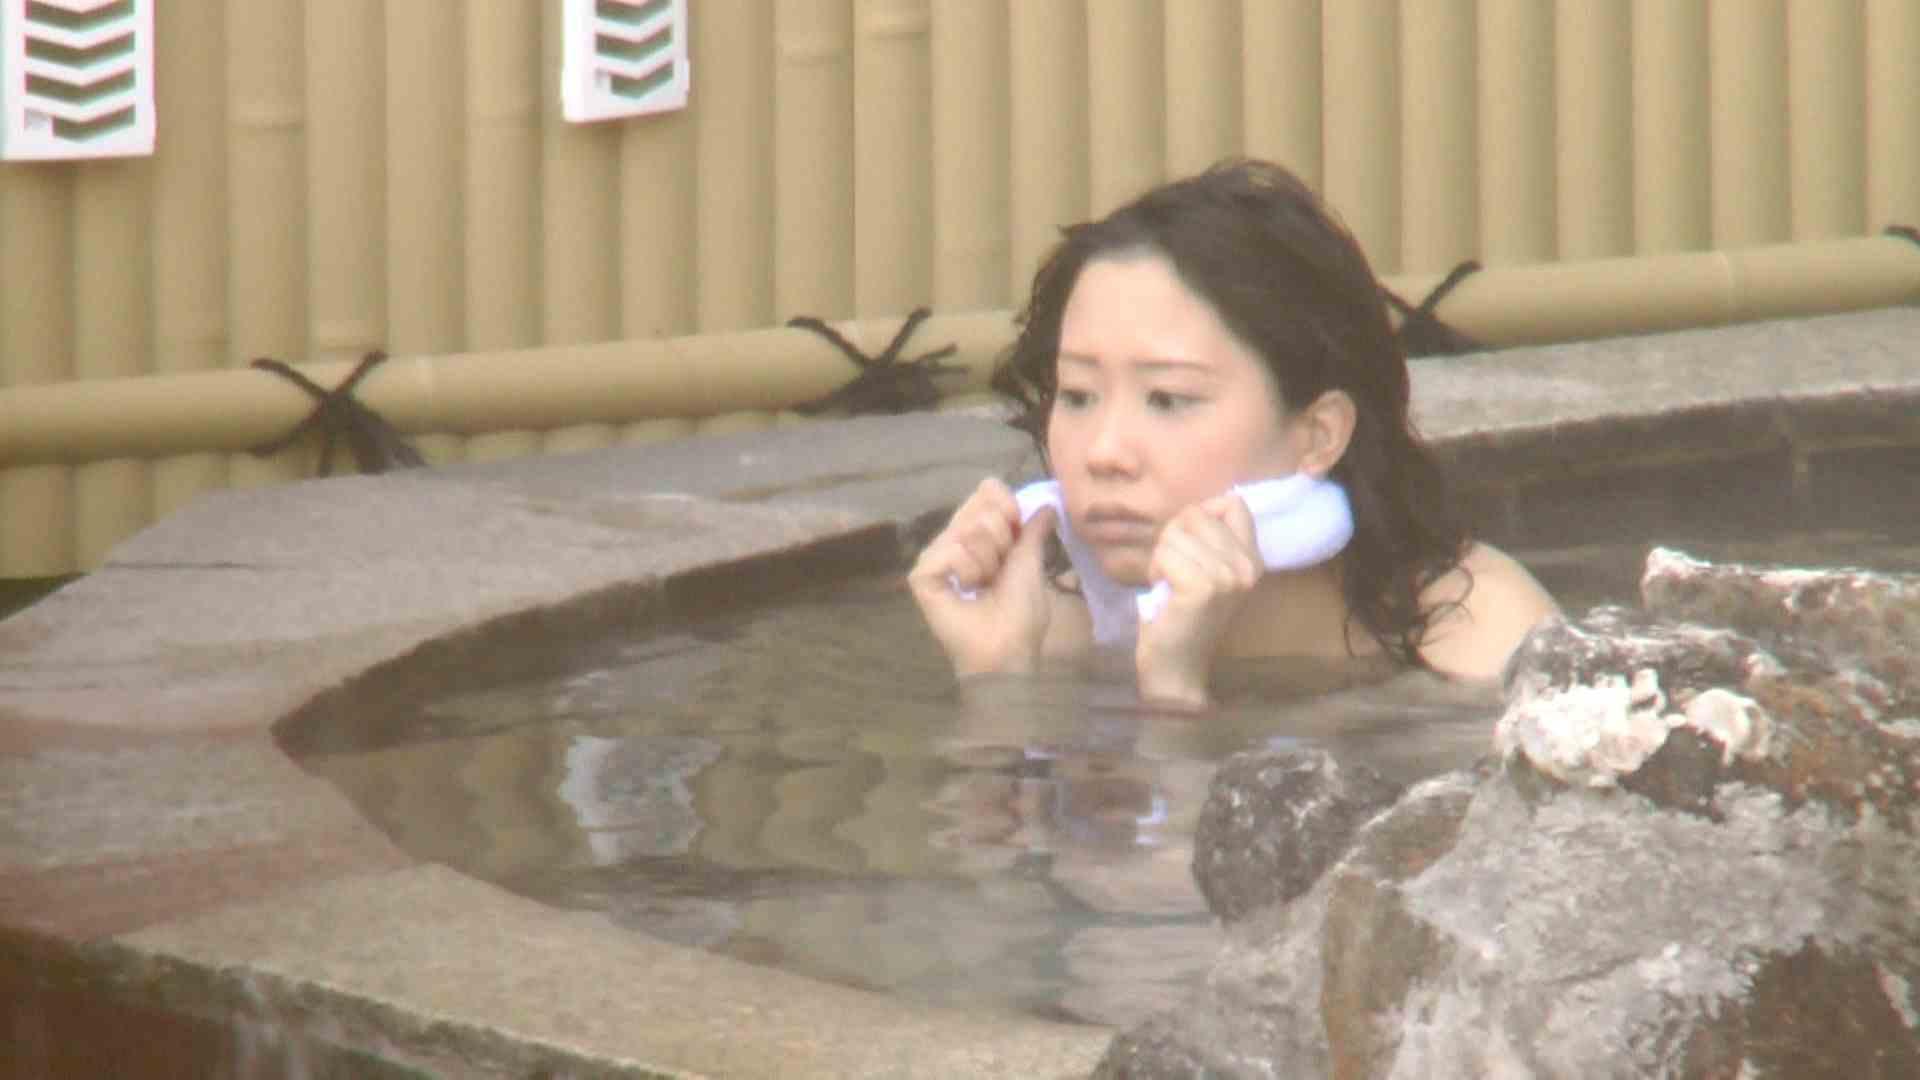 Aquaな露天風呂Vol.211 OLセックス 盗撮アダルト動画キャプチャ 68画像 41